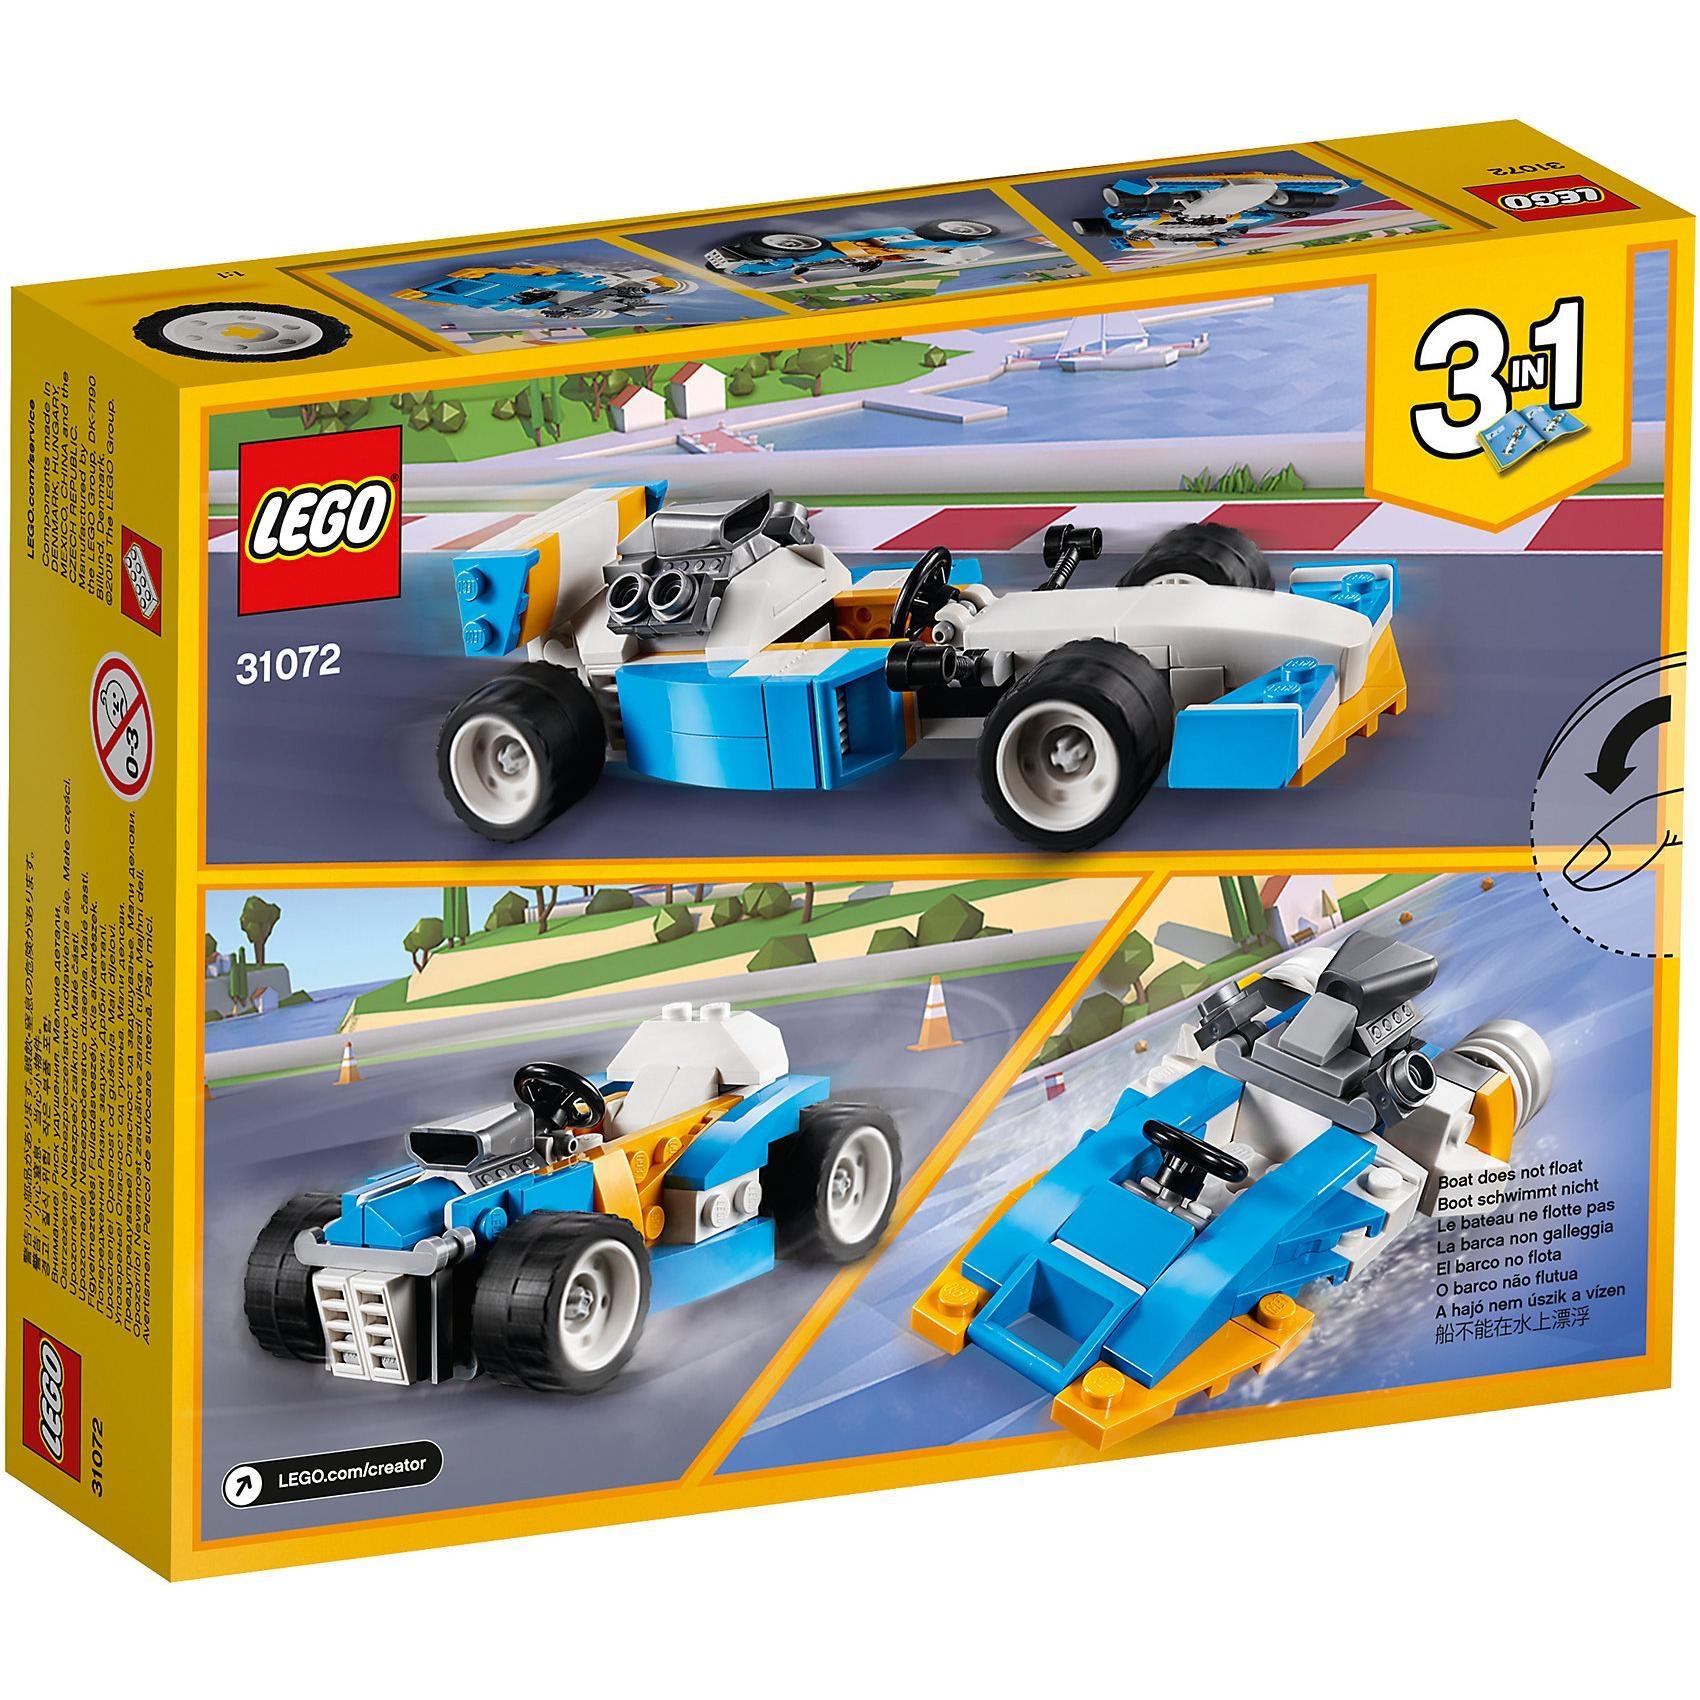 Lego Creator 31072 Ultimative Motor-Power